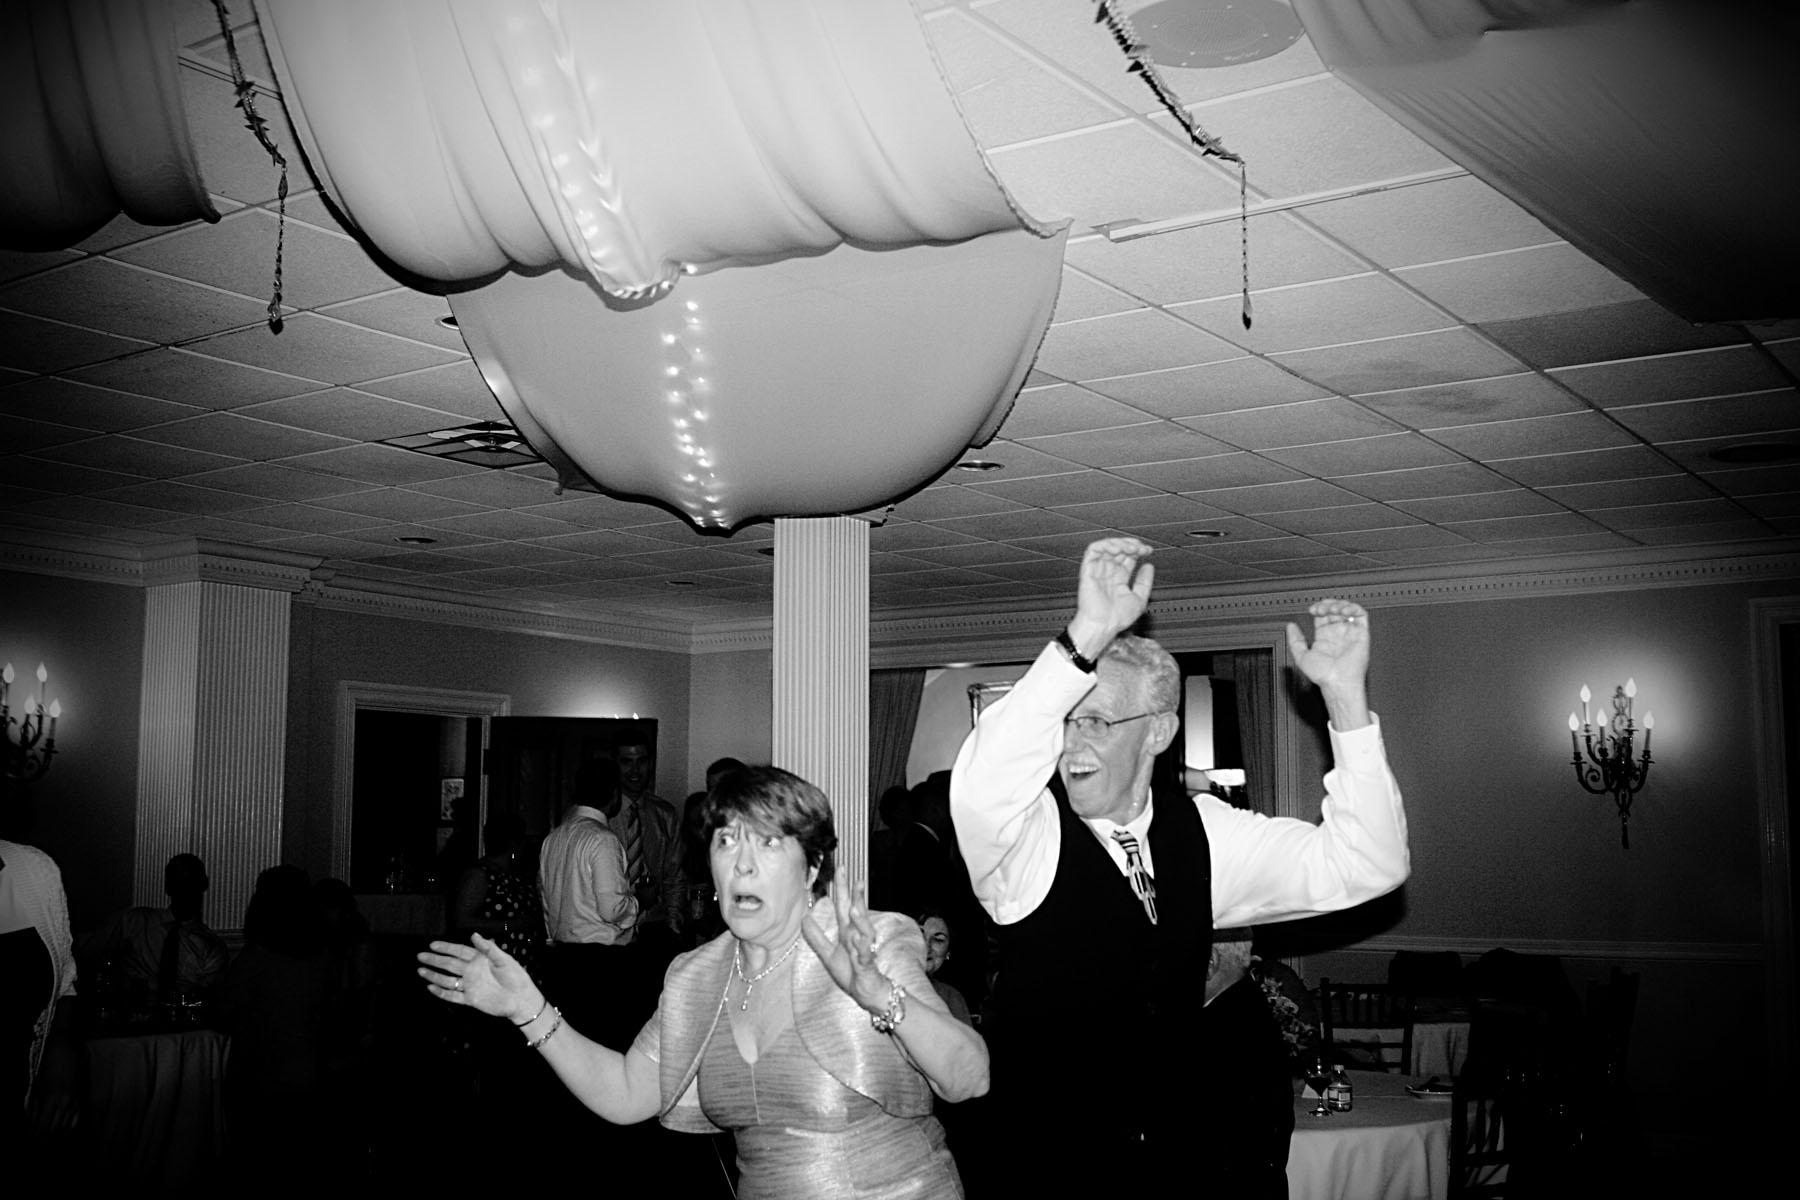 lenny_guest_dancing_bw_4.jpg